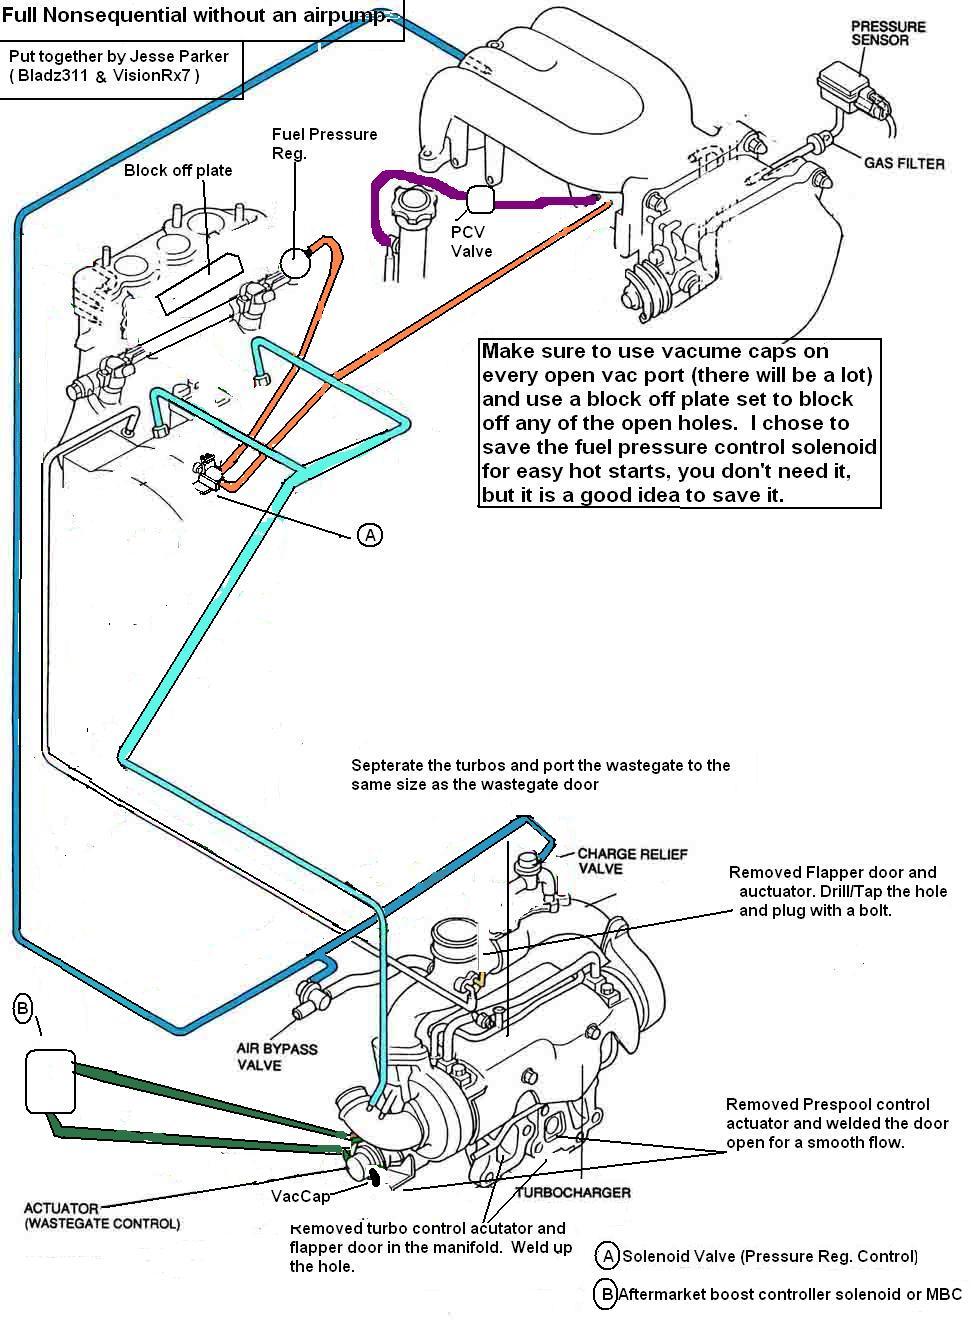 apexi rsm wiring diagram box trailer australia safc wire up 2019 ebook library vafc 1 manual diagrams diy neo for 2003 27l